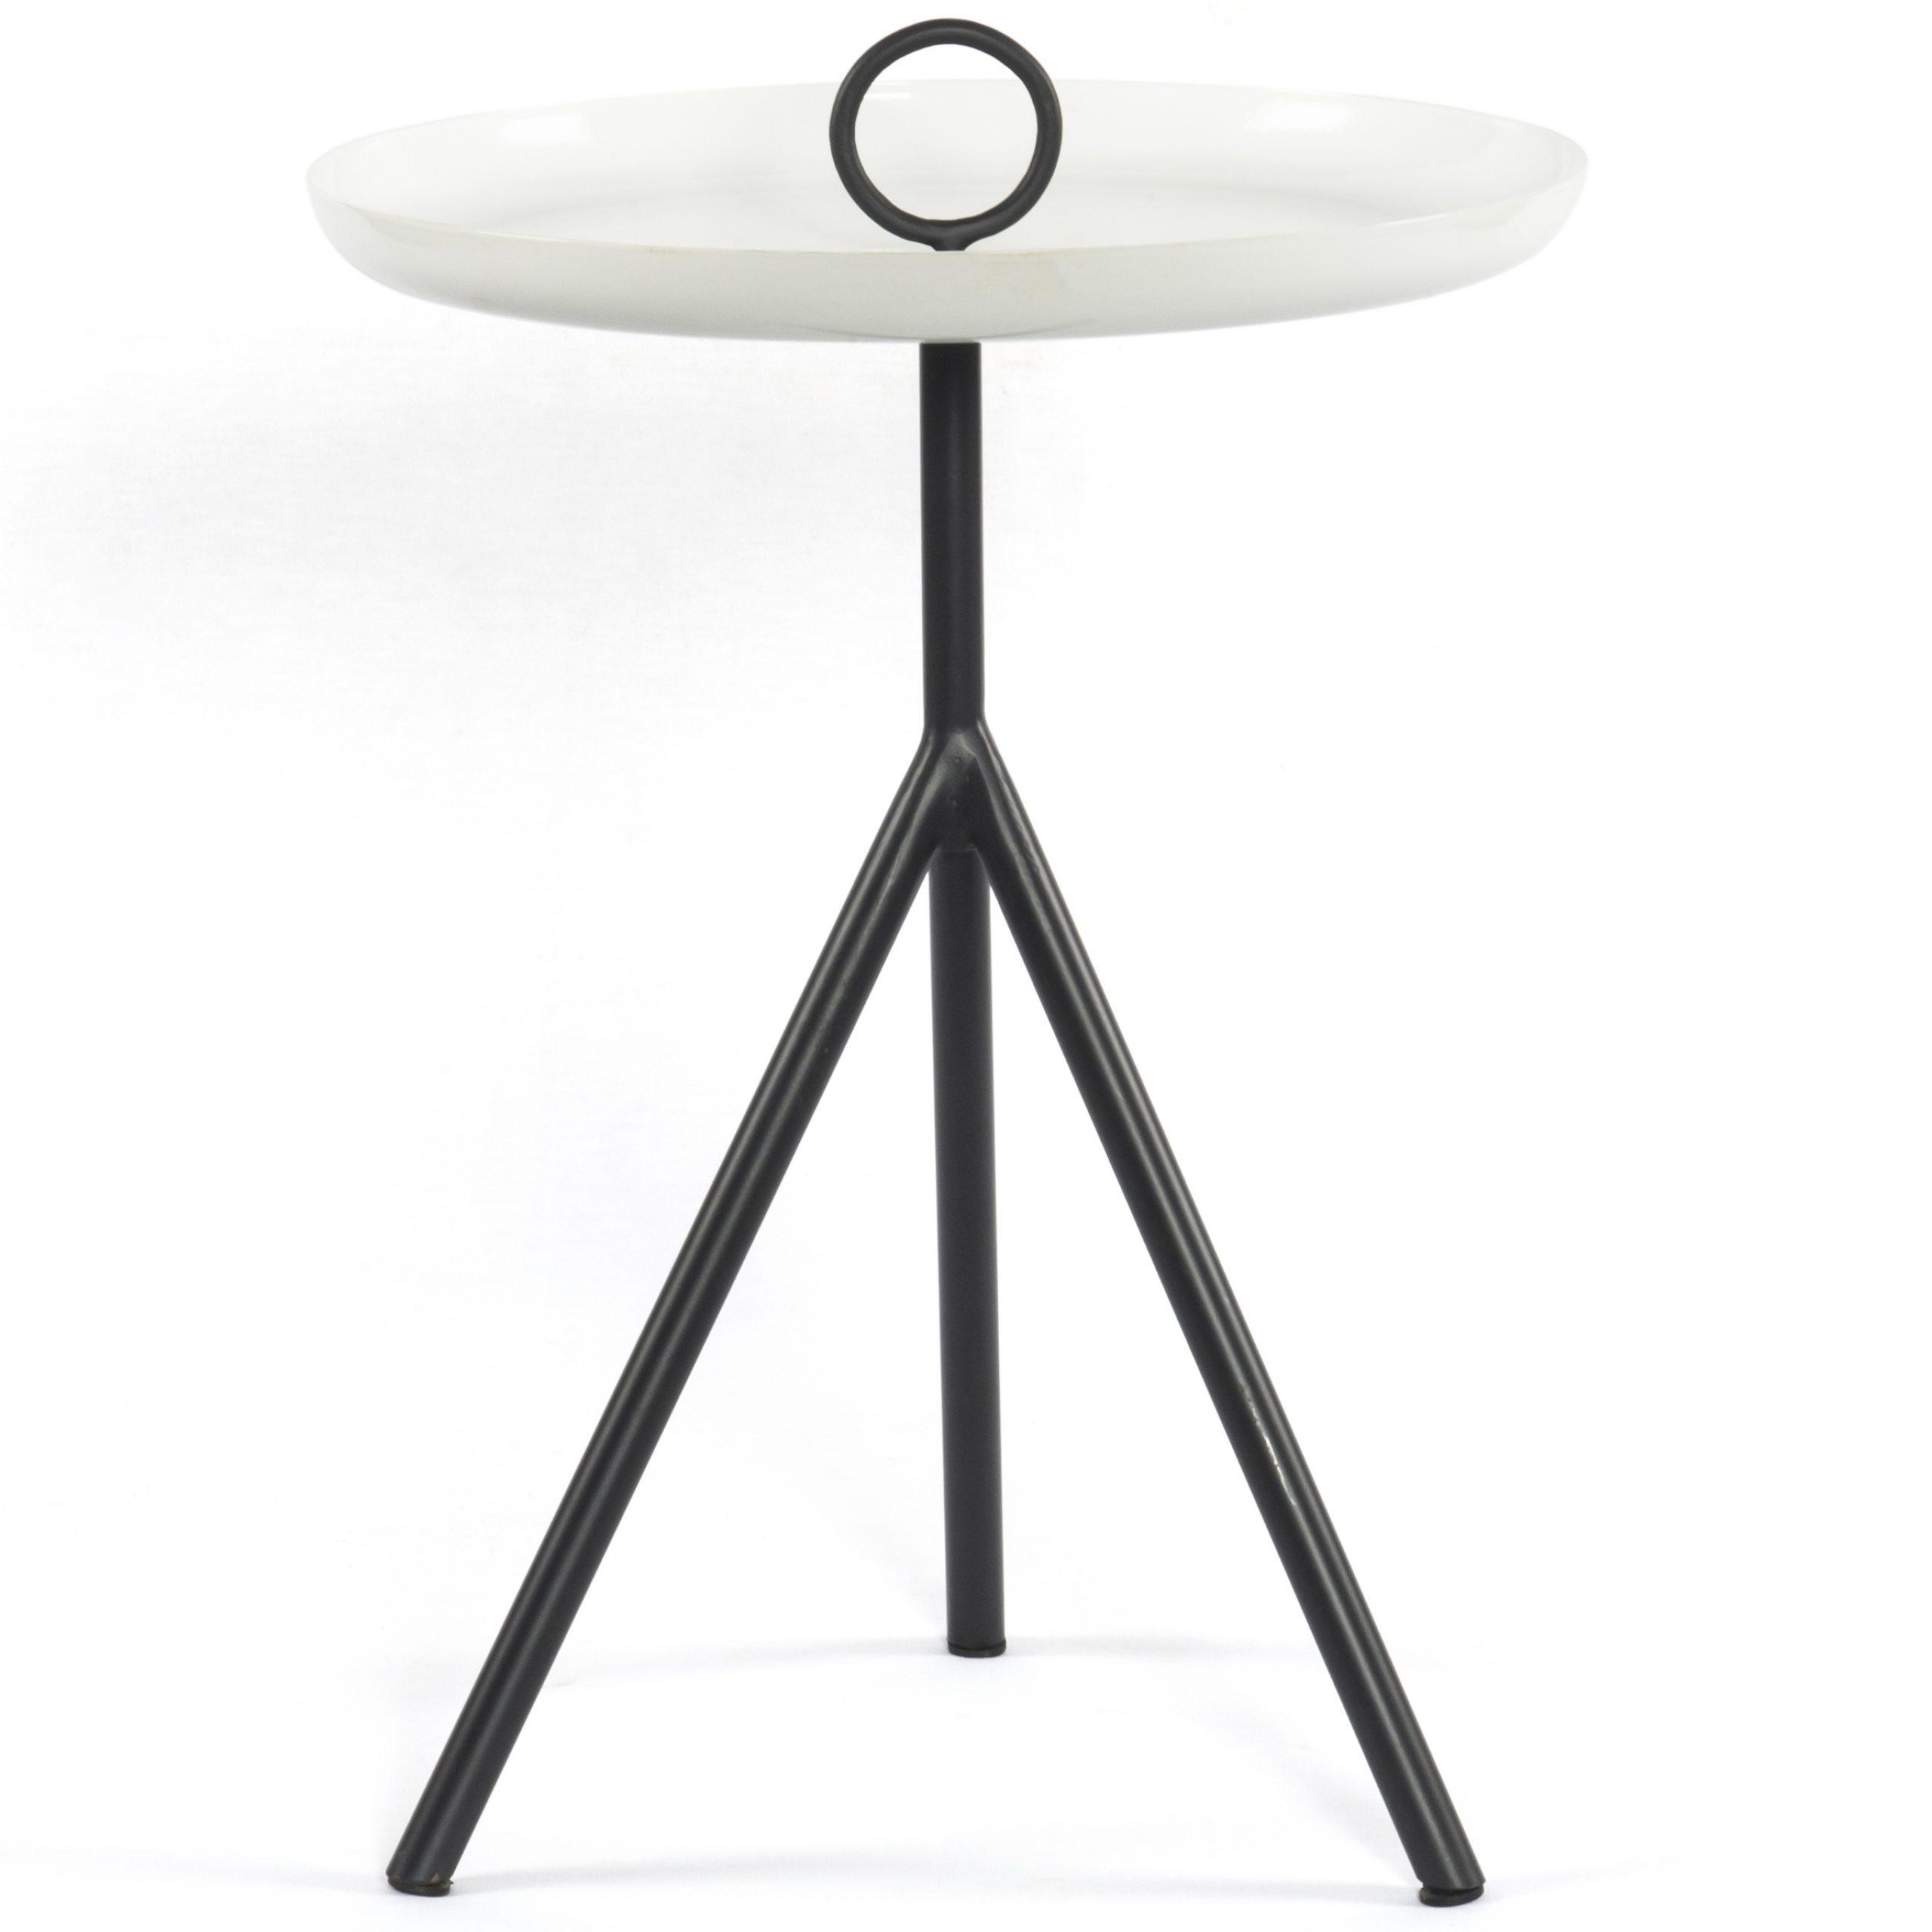 Nolan Round Pedestal Dining Tables inside 2020 Four Hands Nolan Charcoal / Satin White 15'' Wide Round Pedestal Table